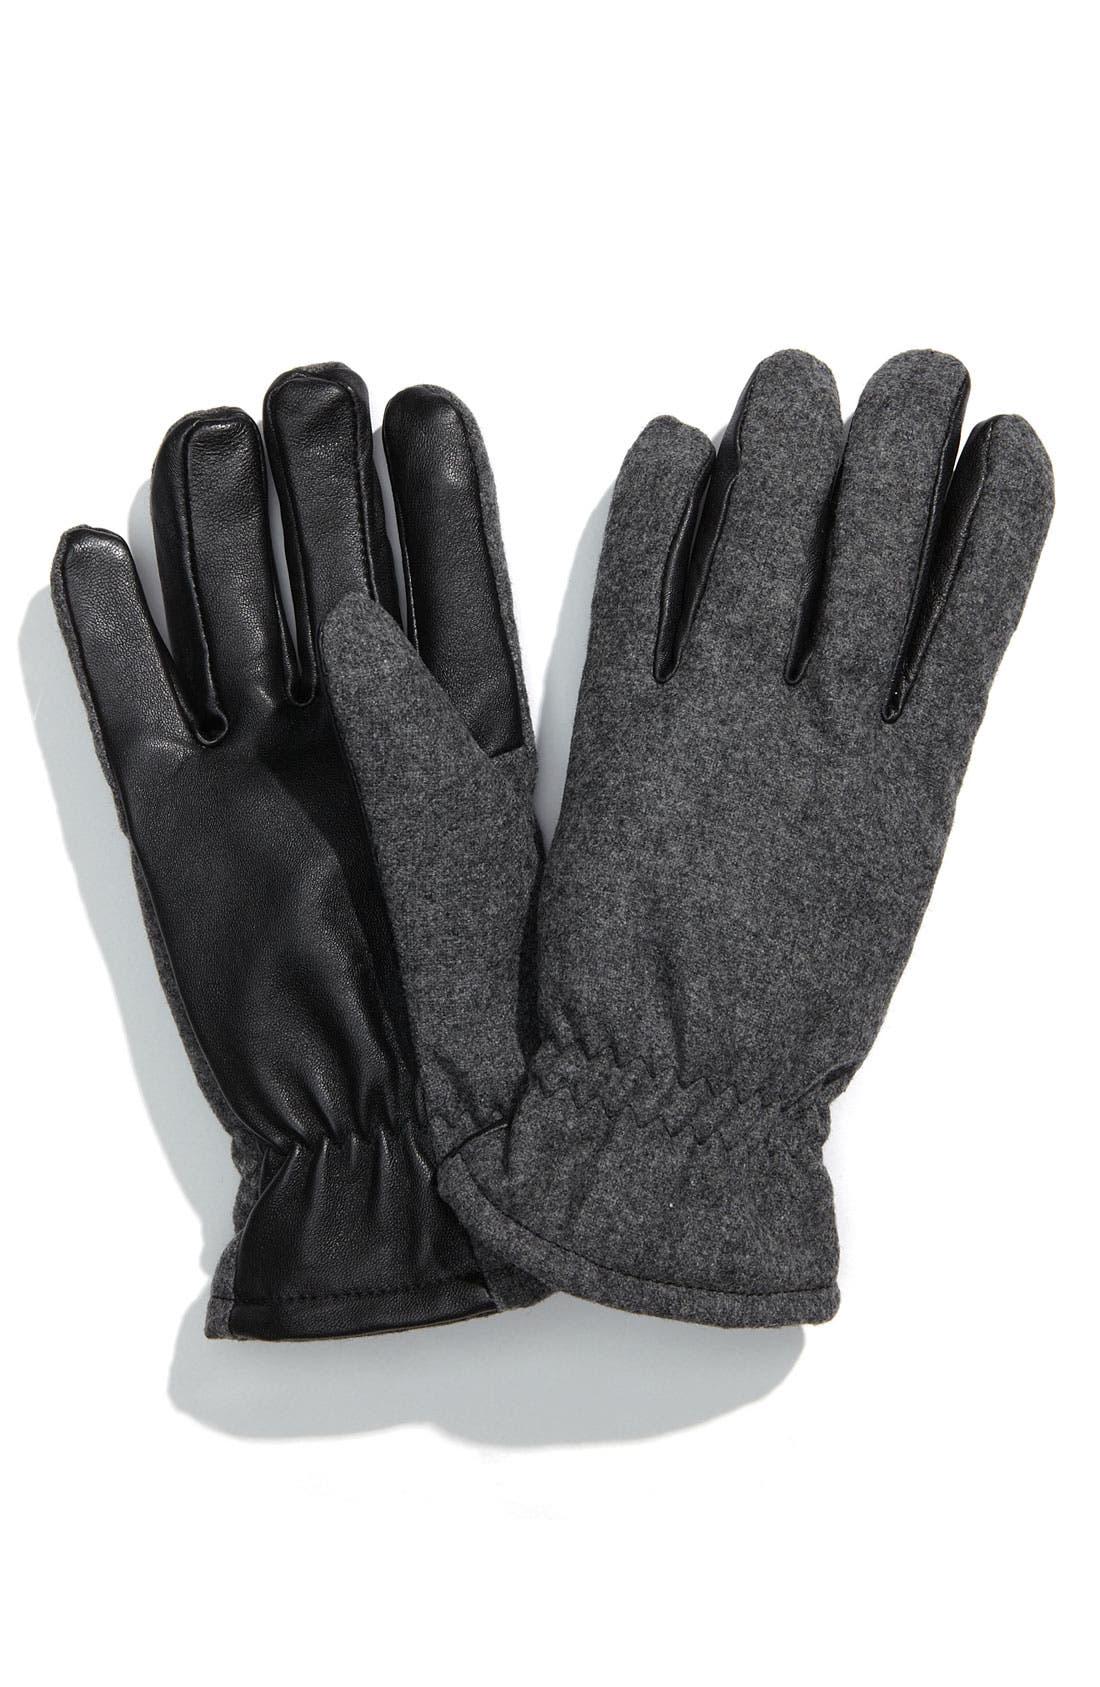 GRANDOE GLOVES,                             'Classic Sensor Touch' Gloves,                             Main thumbnail 1, color,                             098